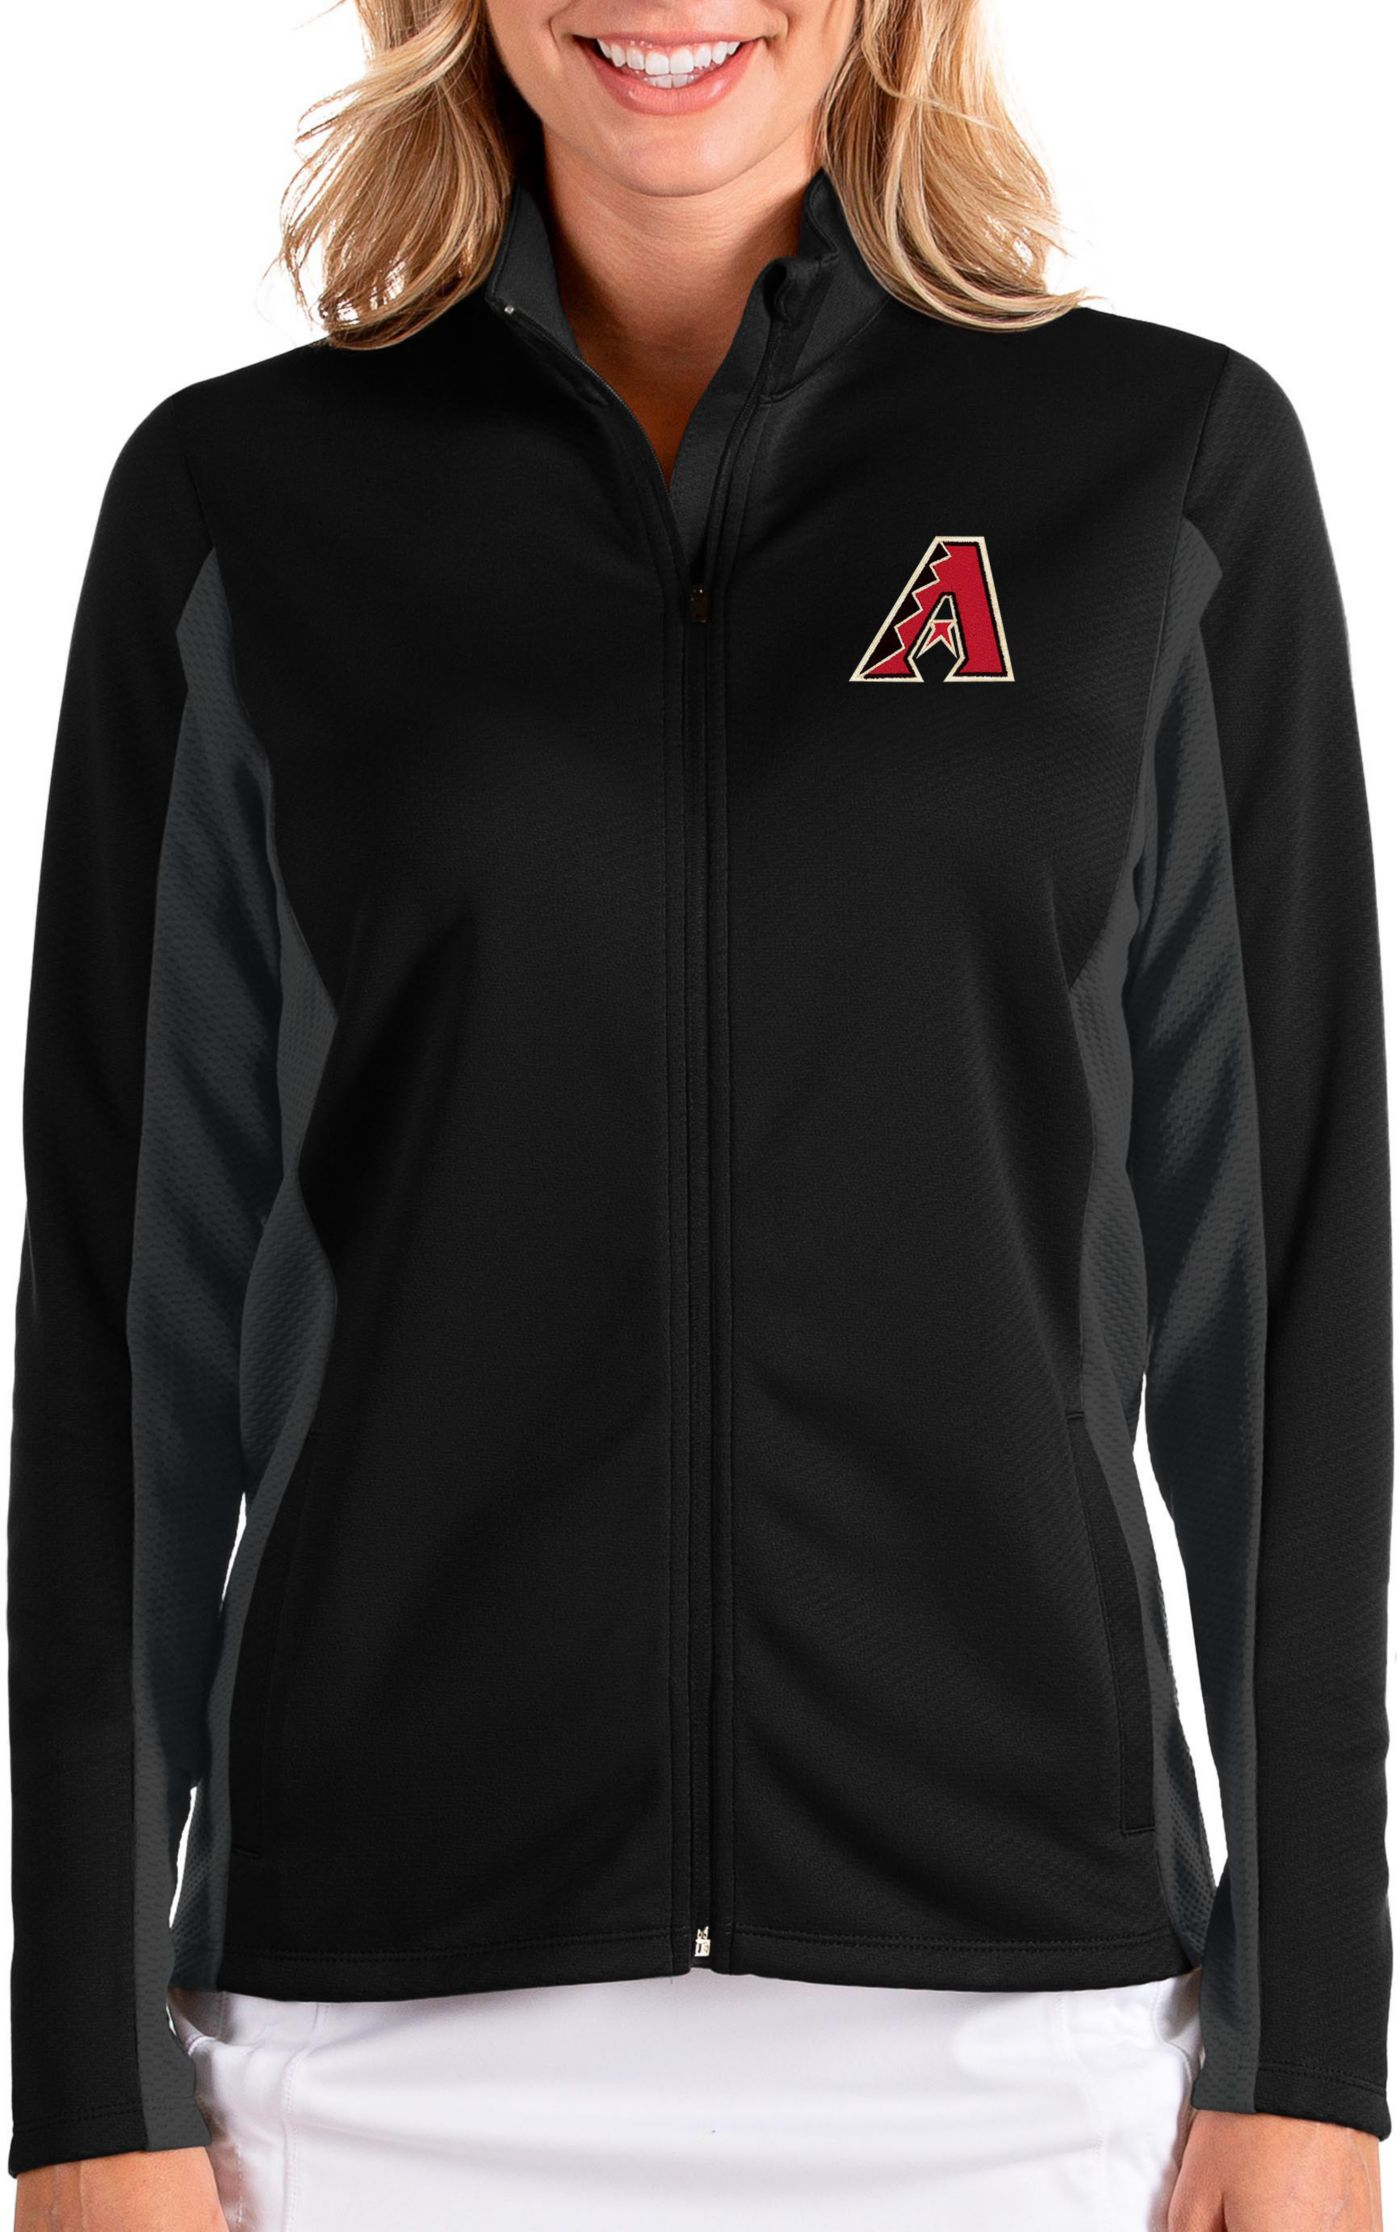 Antigua Women's Arizona Diamondbacks Black Passage Full-Zip Jacket